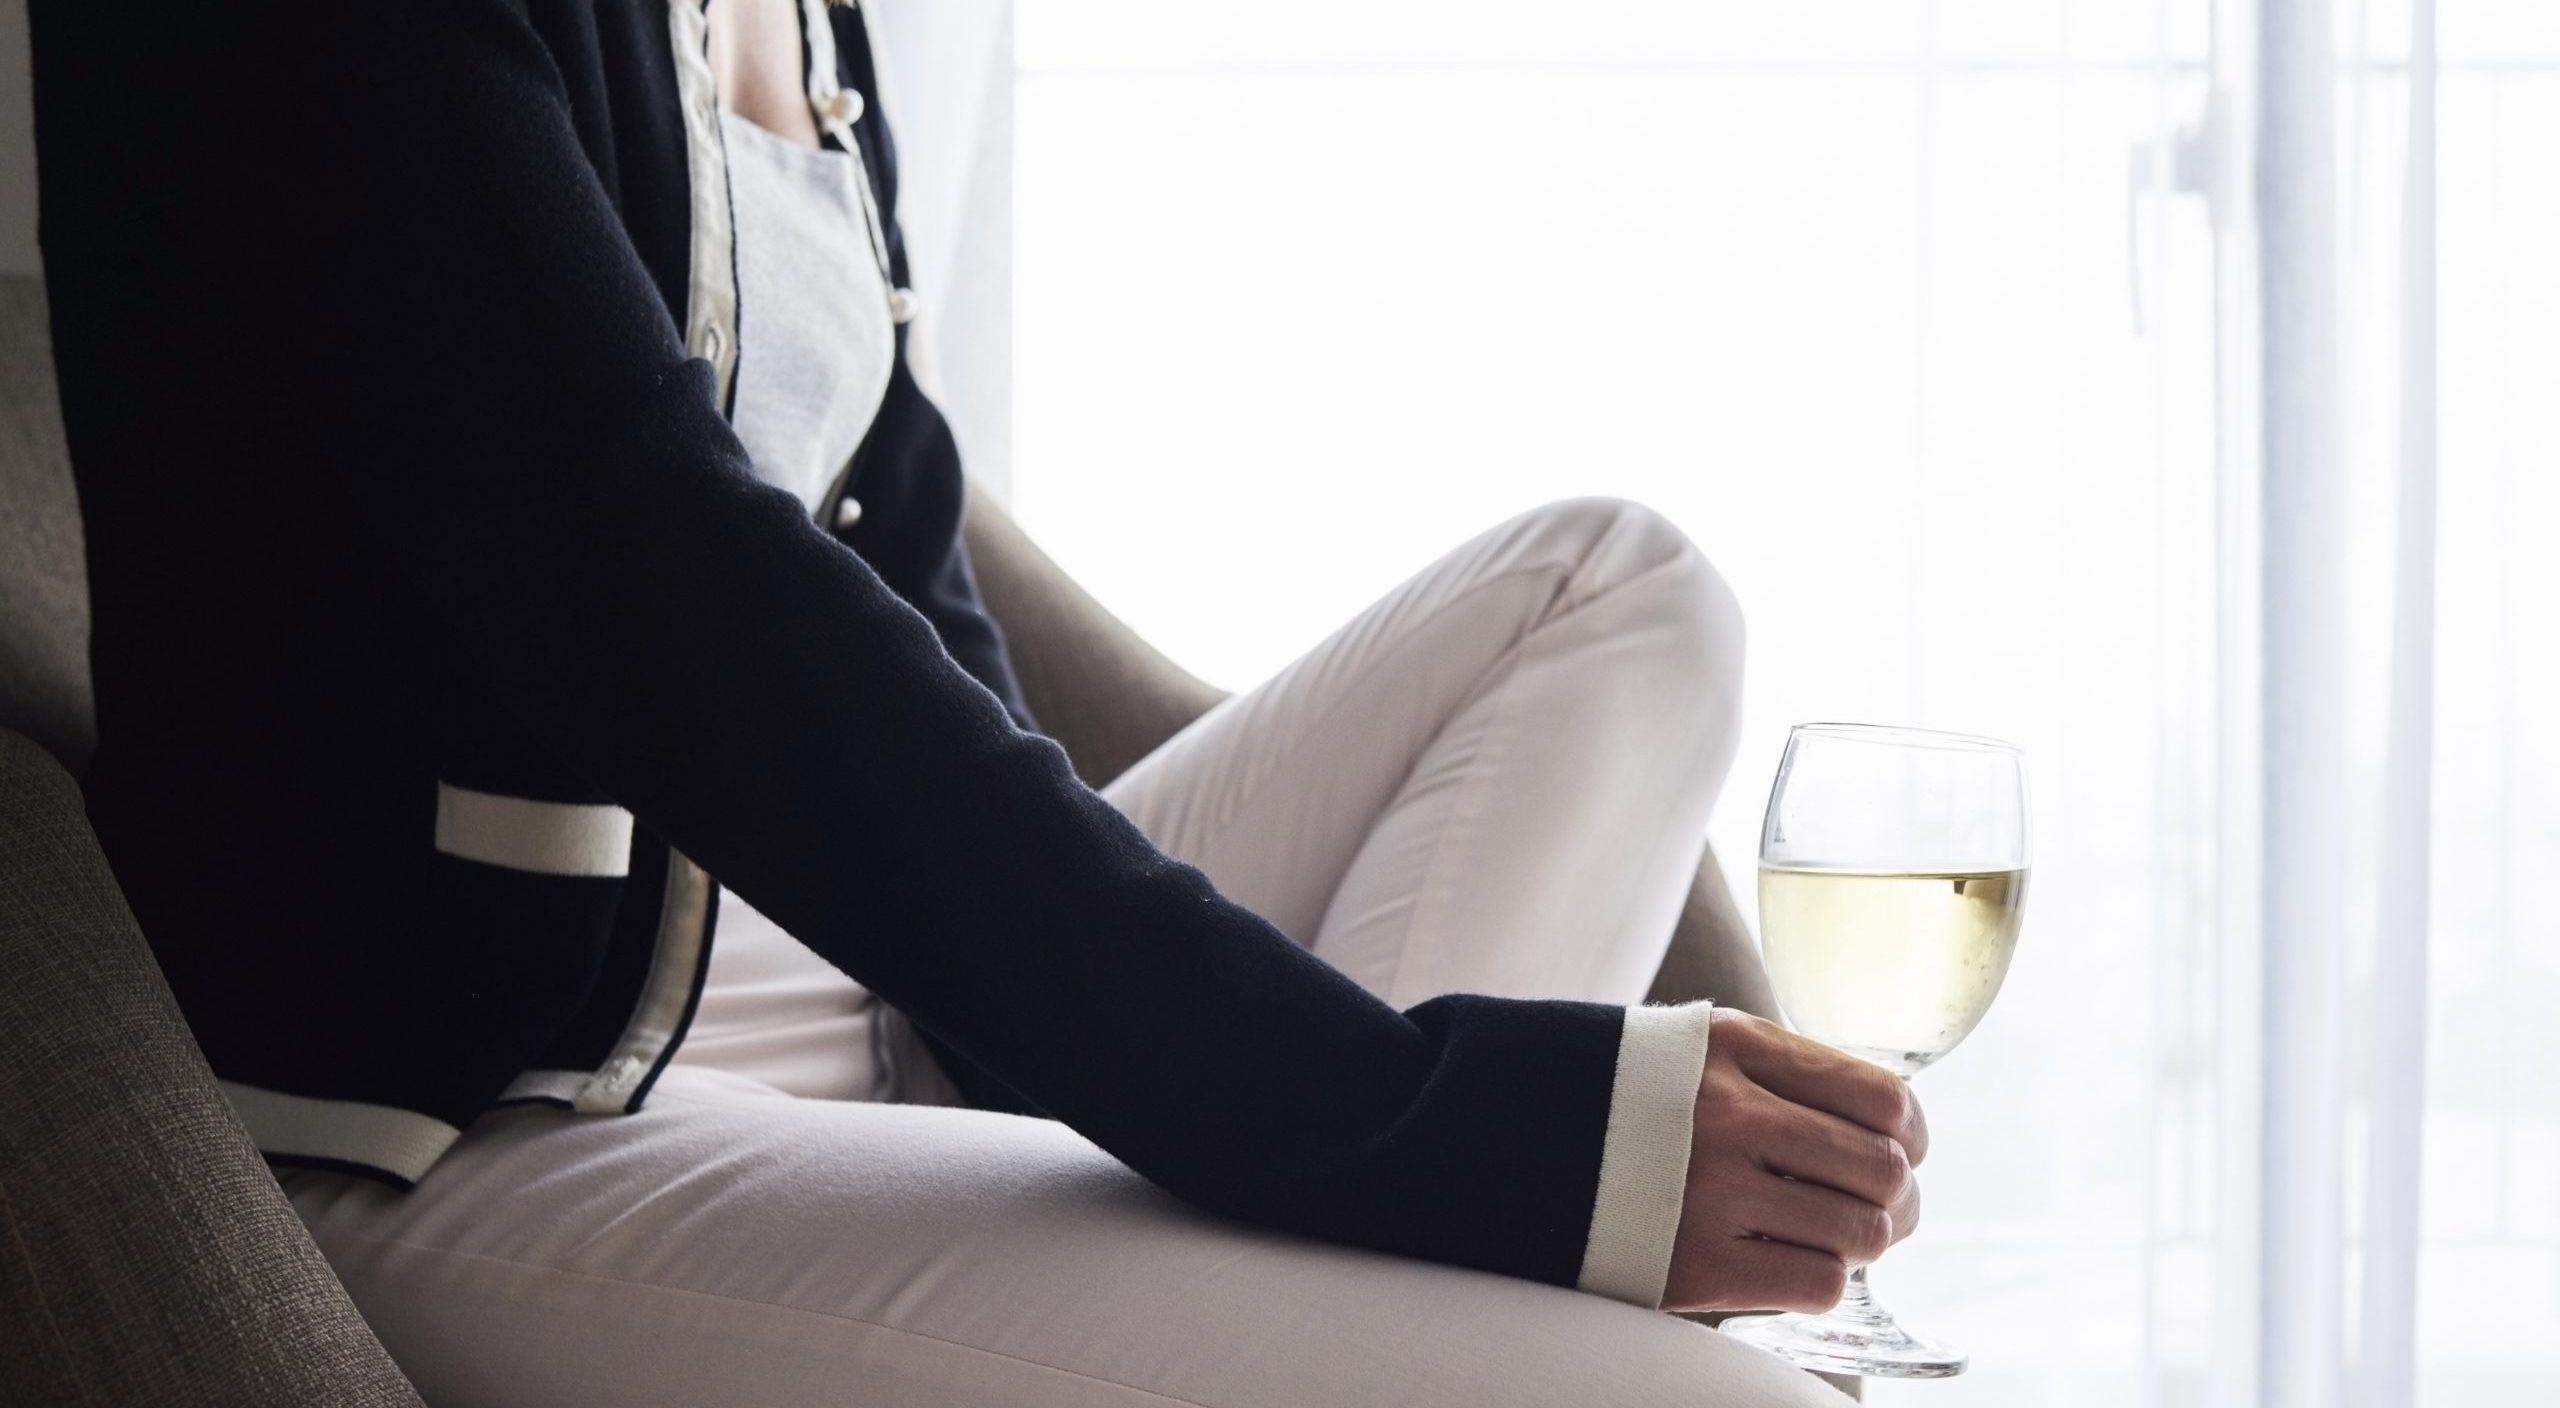 Coronavirus warning: Alcohol could make you more vulnerable